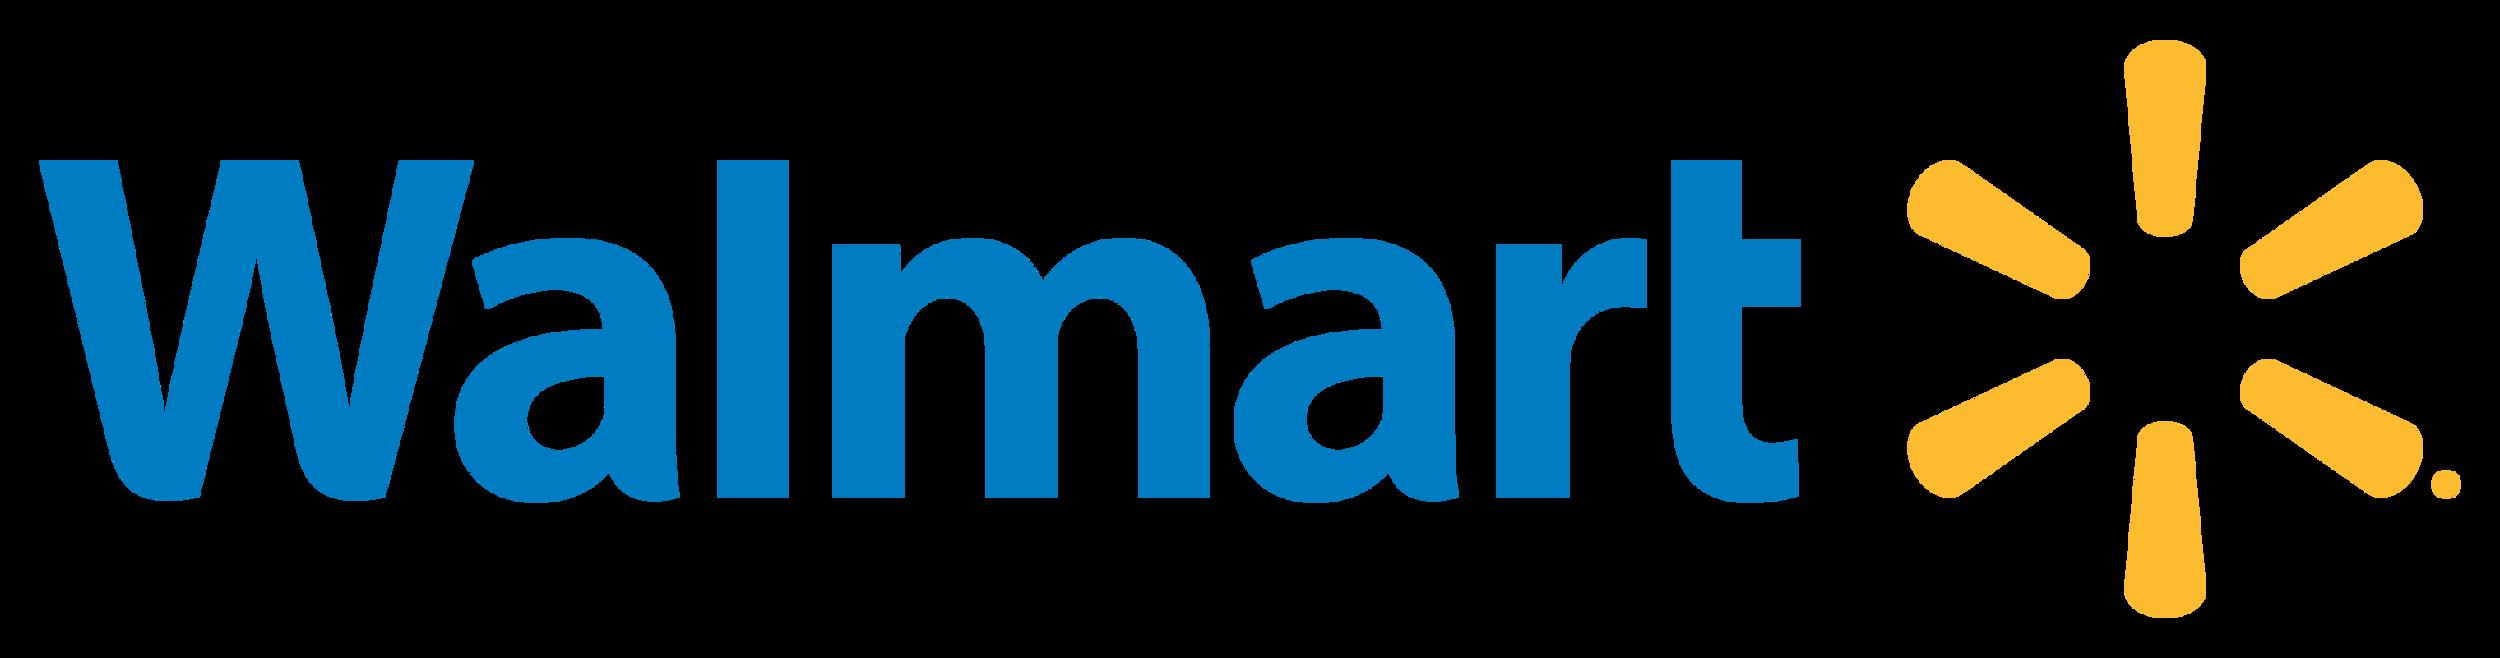 Walmart VR AR VRARA.png